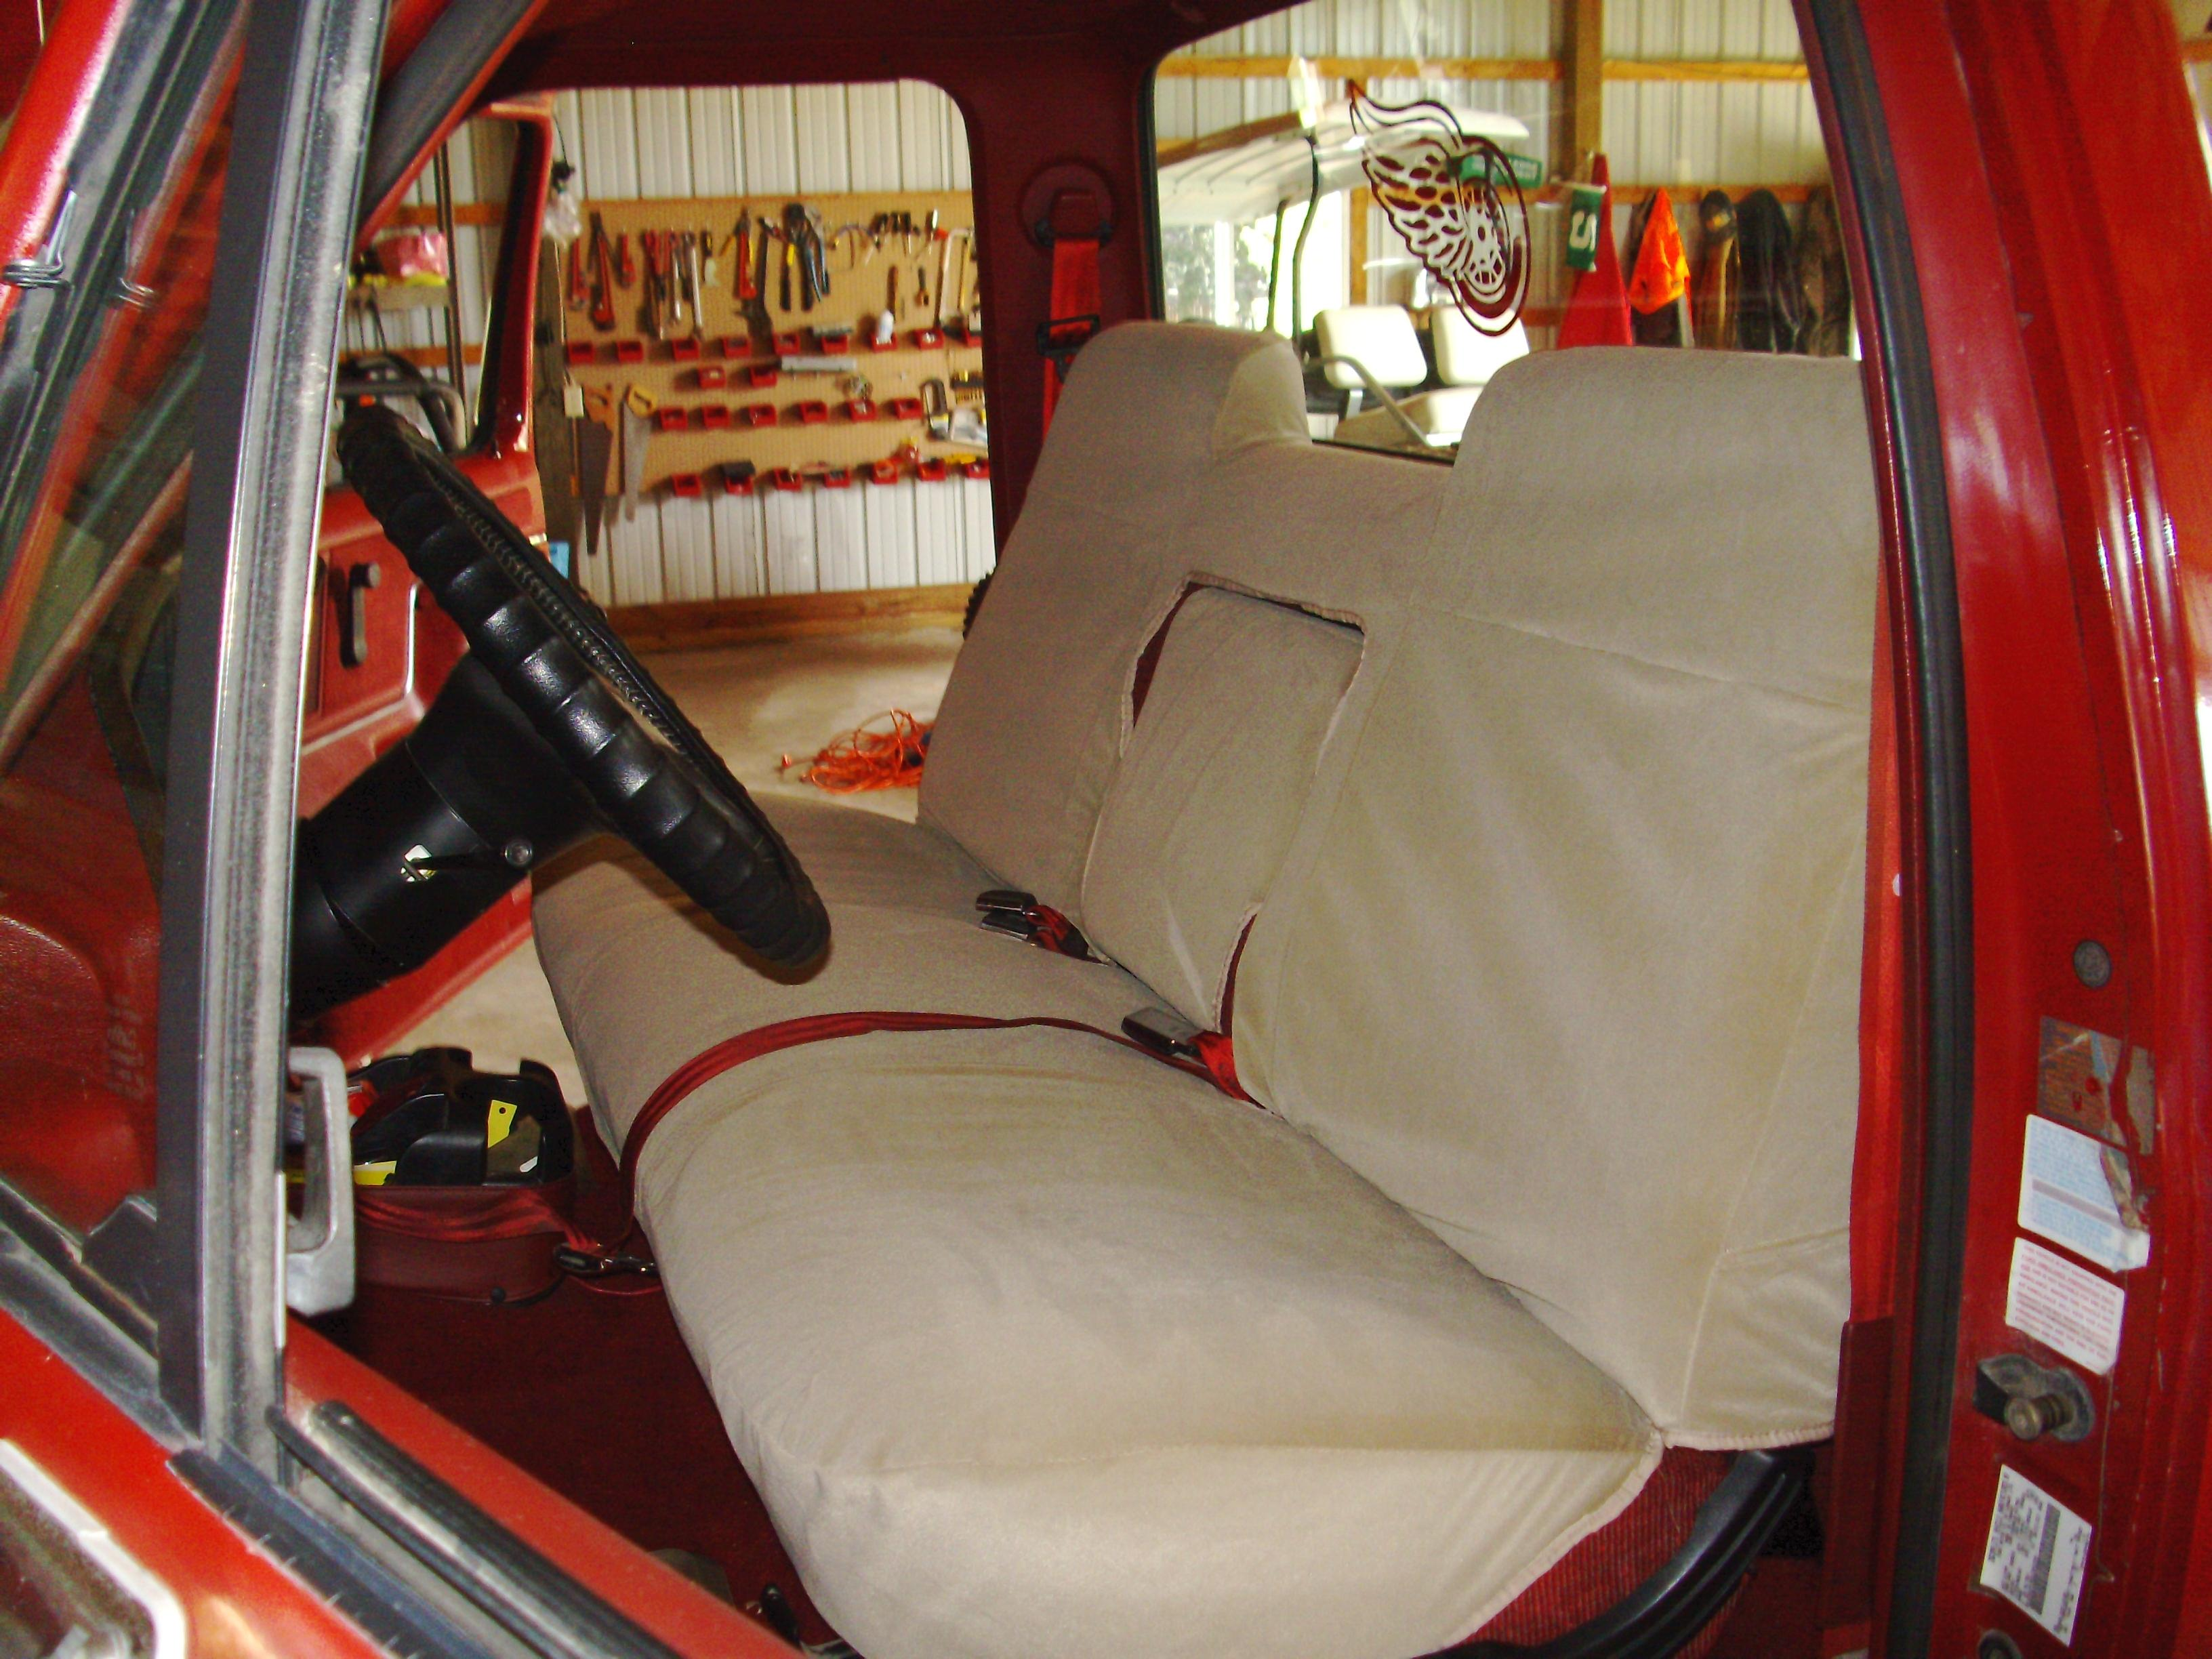 1986 1991 Ford Truck Regular Cab Front High Back Bench